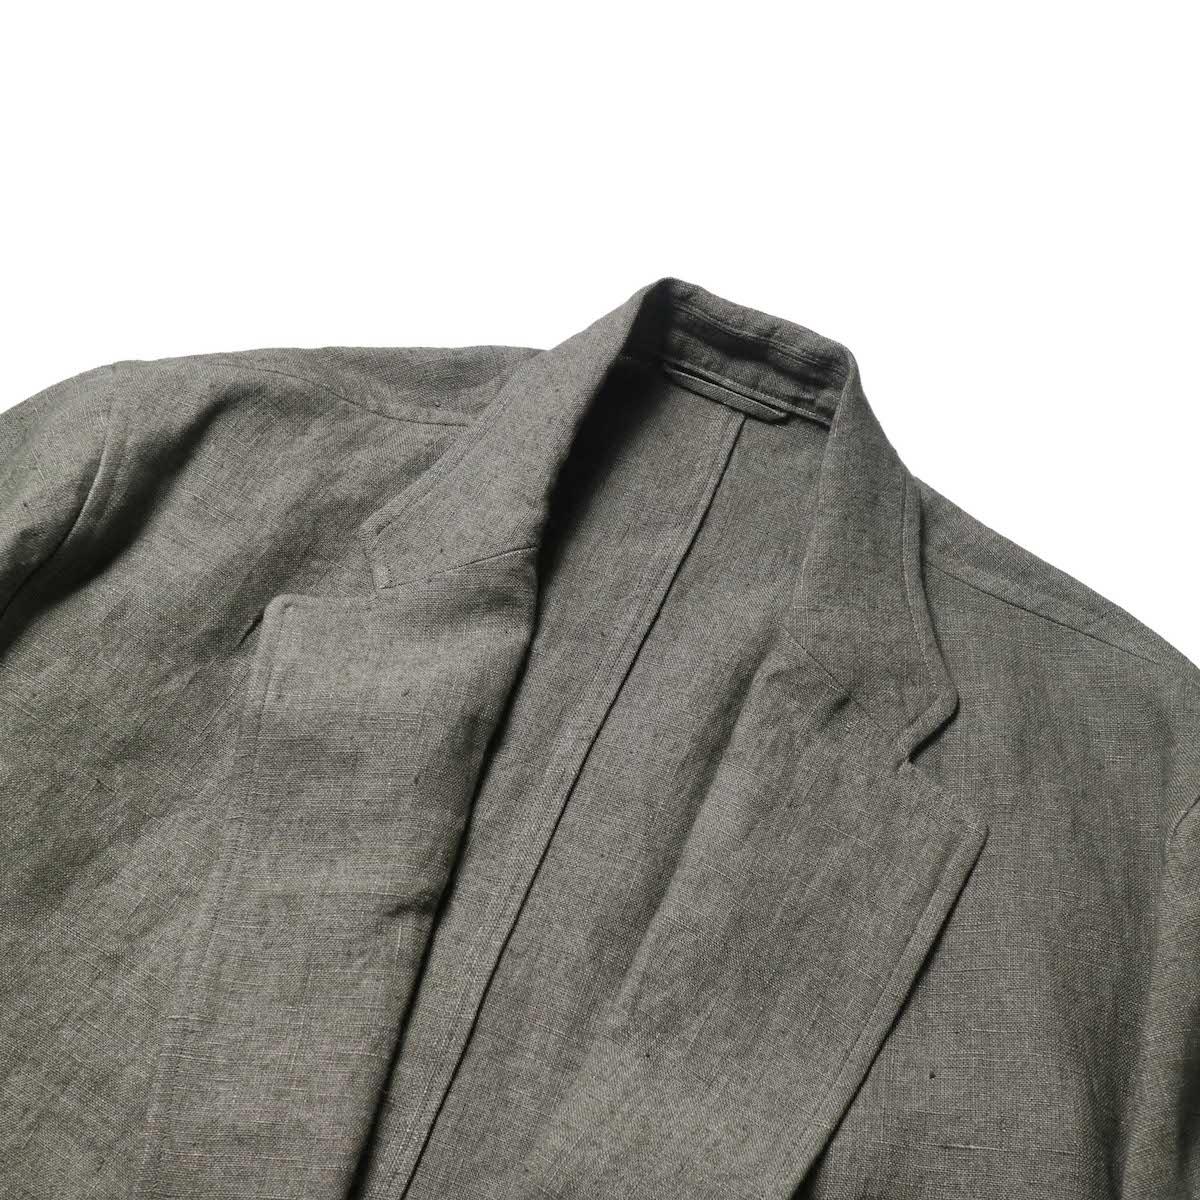 blurhms / Wash Linen Cardigan Jacket (KhakiGrey)ノッチドラペル